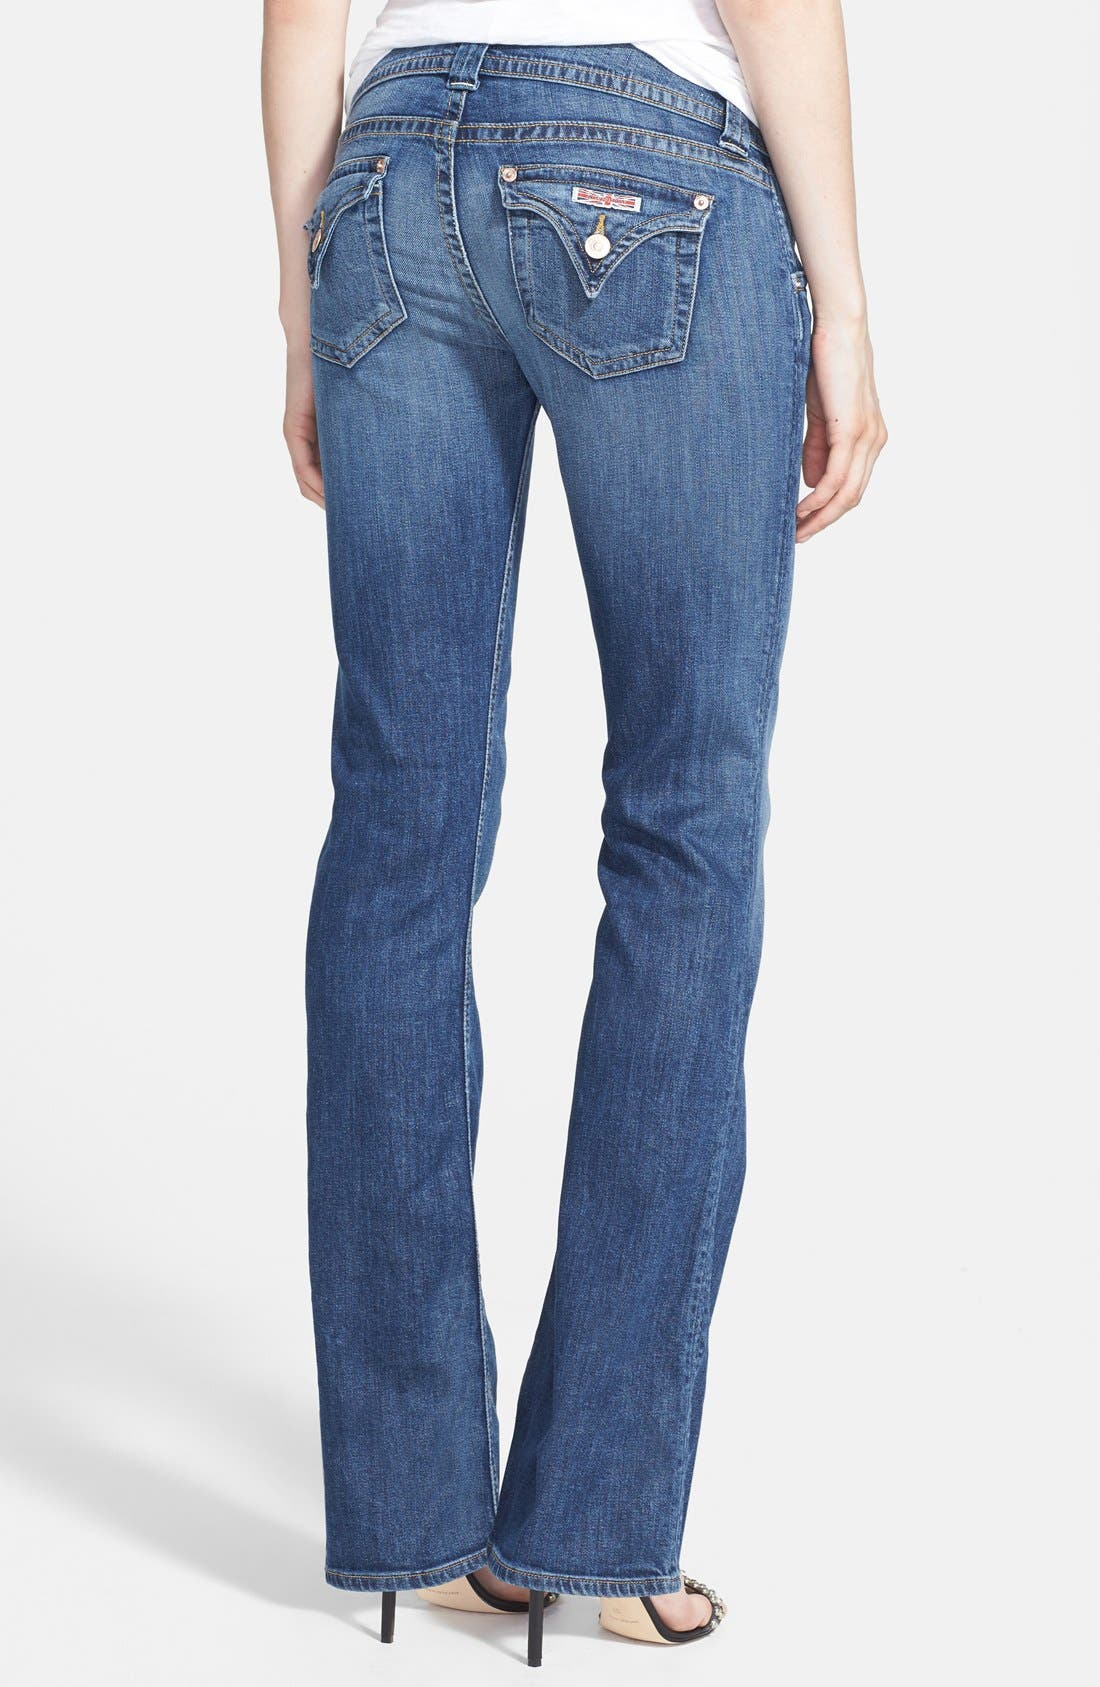 Alternate Image 2  - Hudson Jeans 'Signature' Bootcut Jeans (Hackney) (Petite)